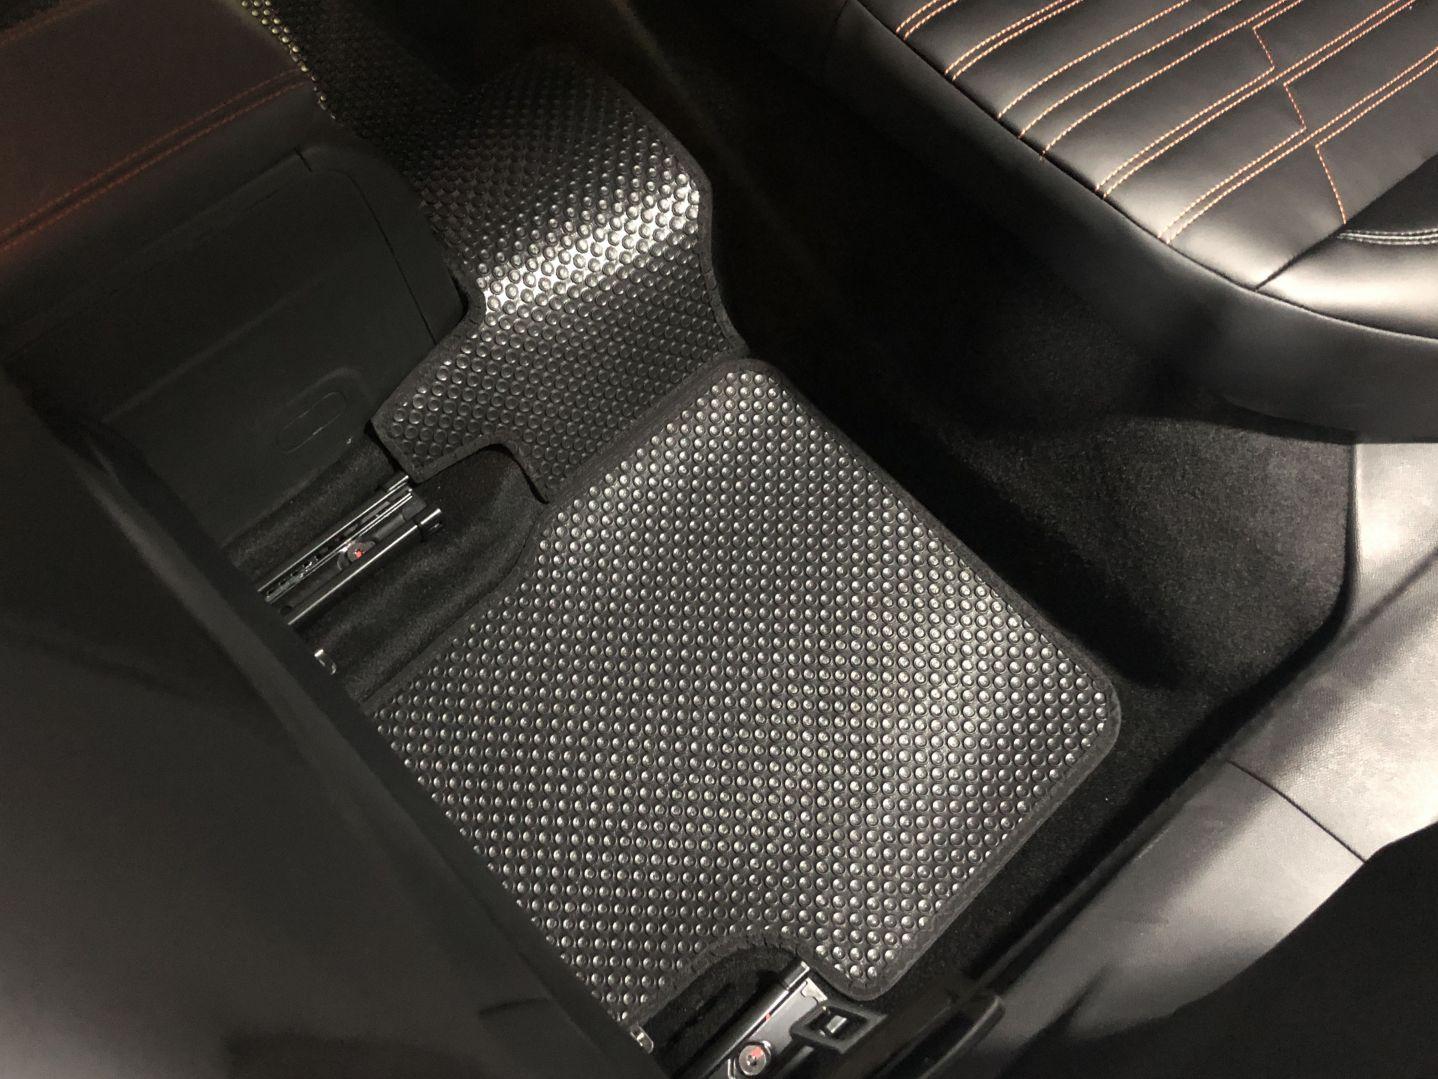 Thảm lót sàn Peugeot 2008 2020